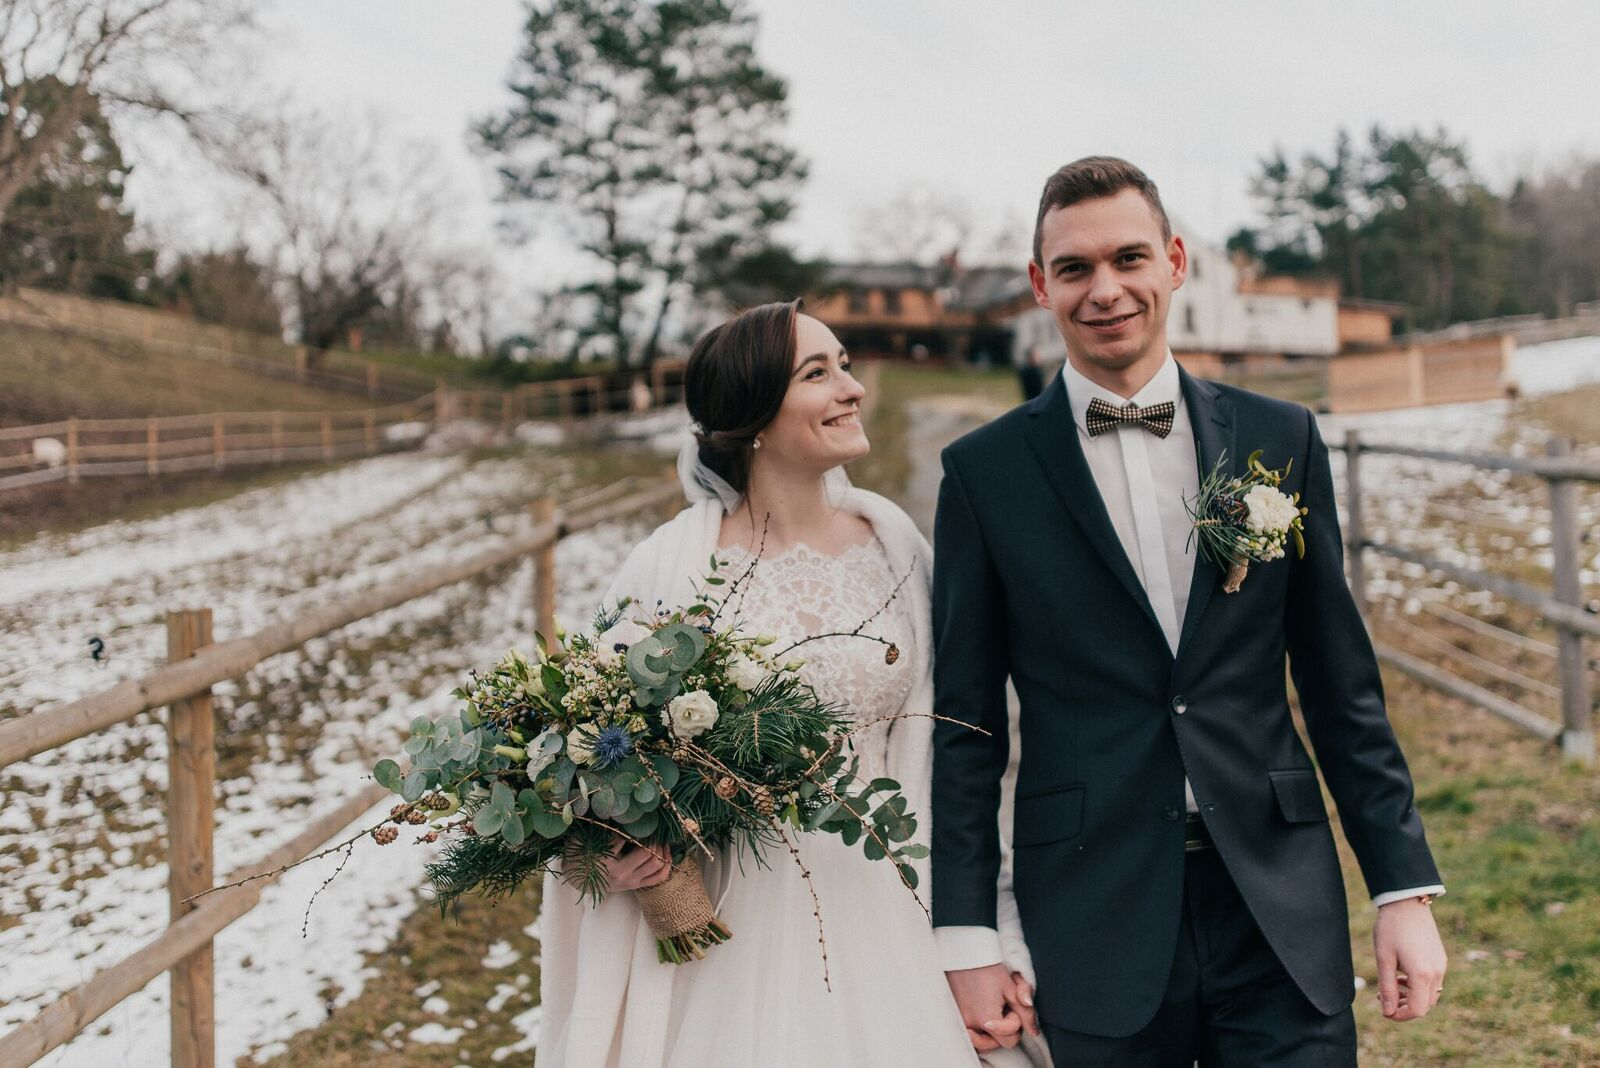 Alzbeta A Ondrej Kouzlo Zimni Svatby Pribehy Odted Naporad